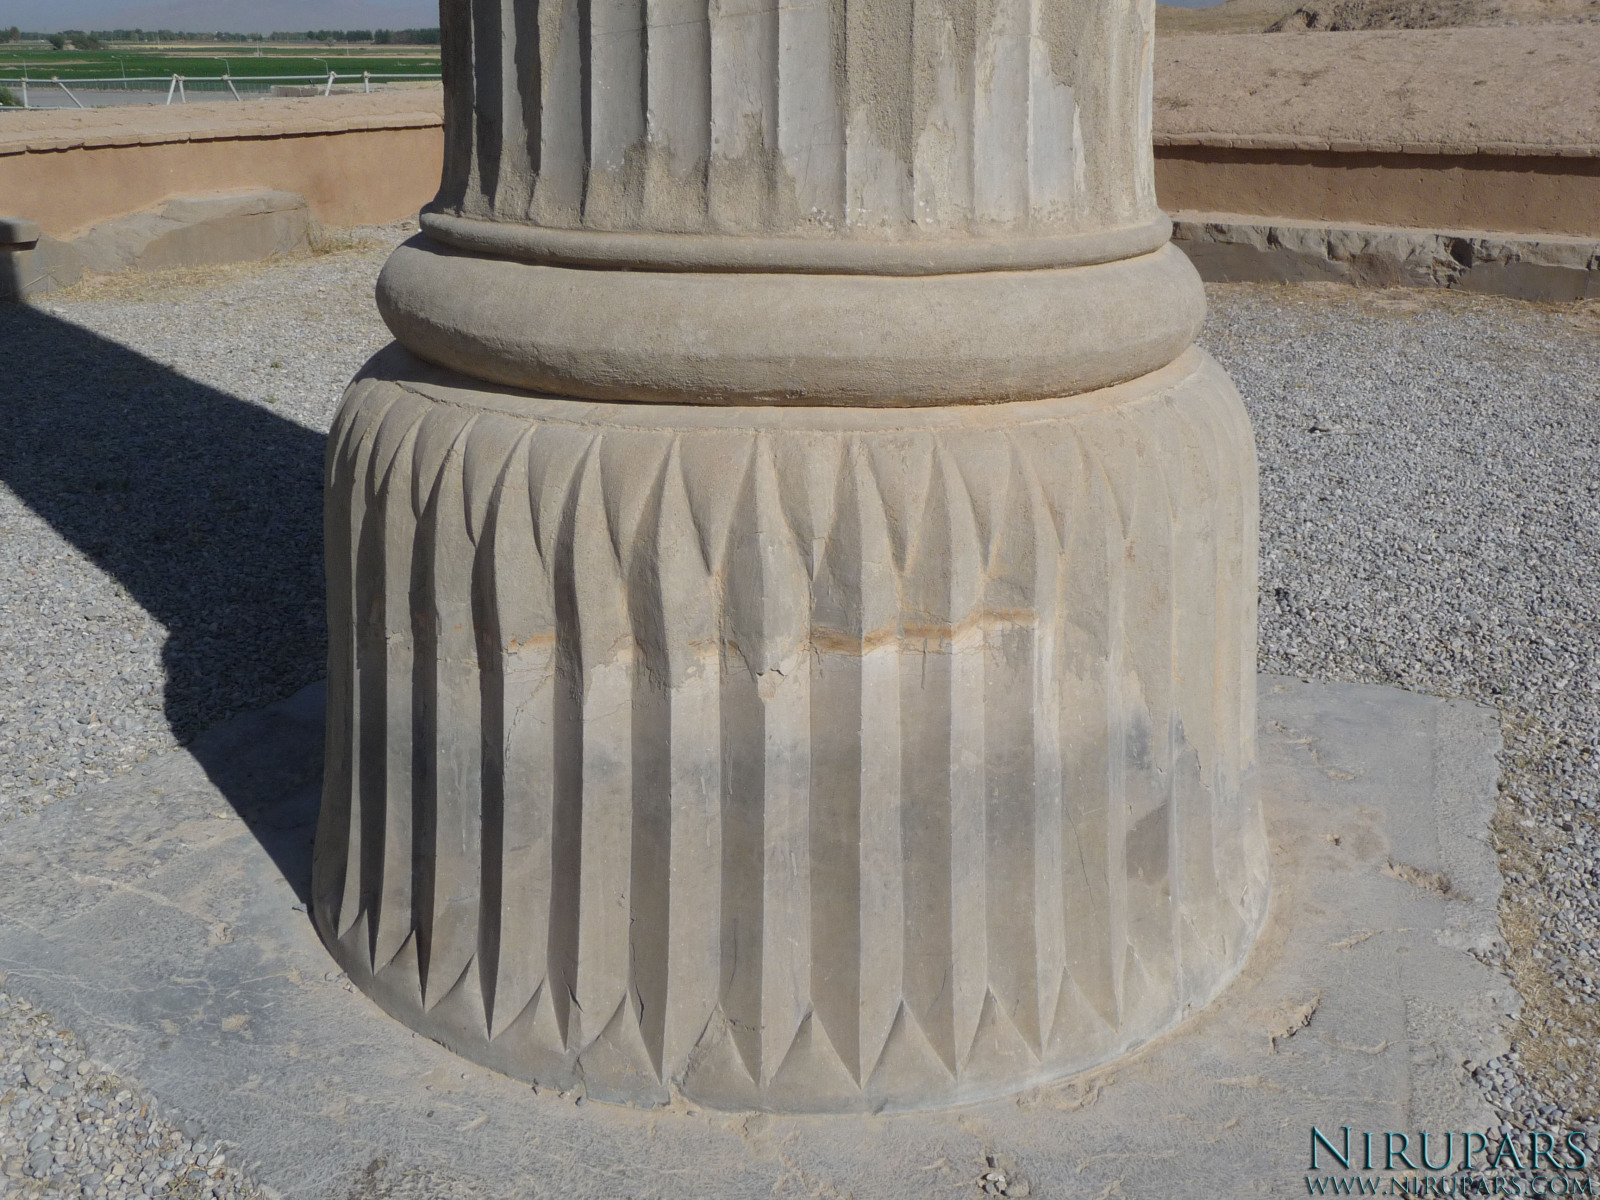 Persepolis - Gate of all Nations - Column Base